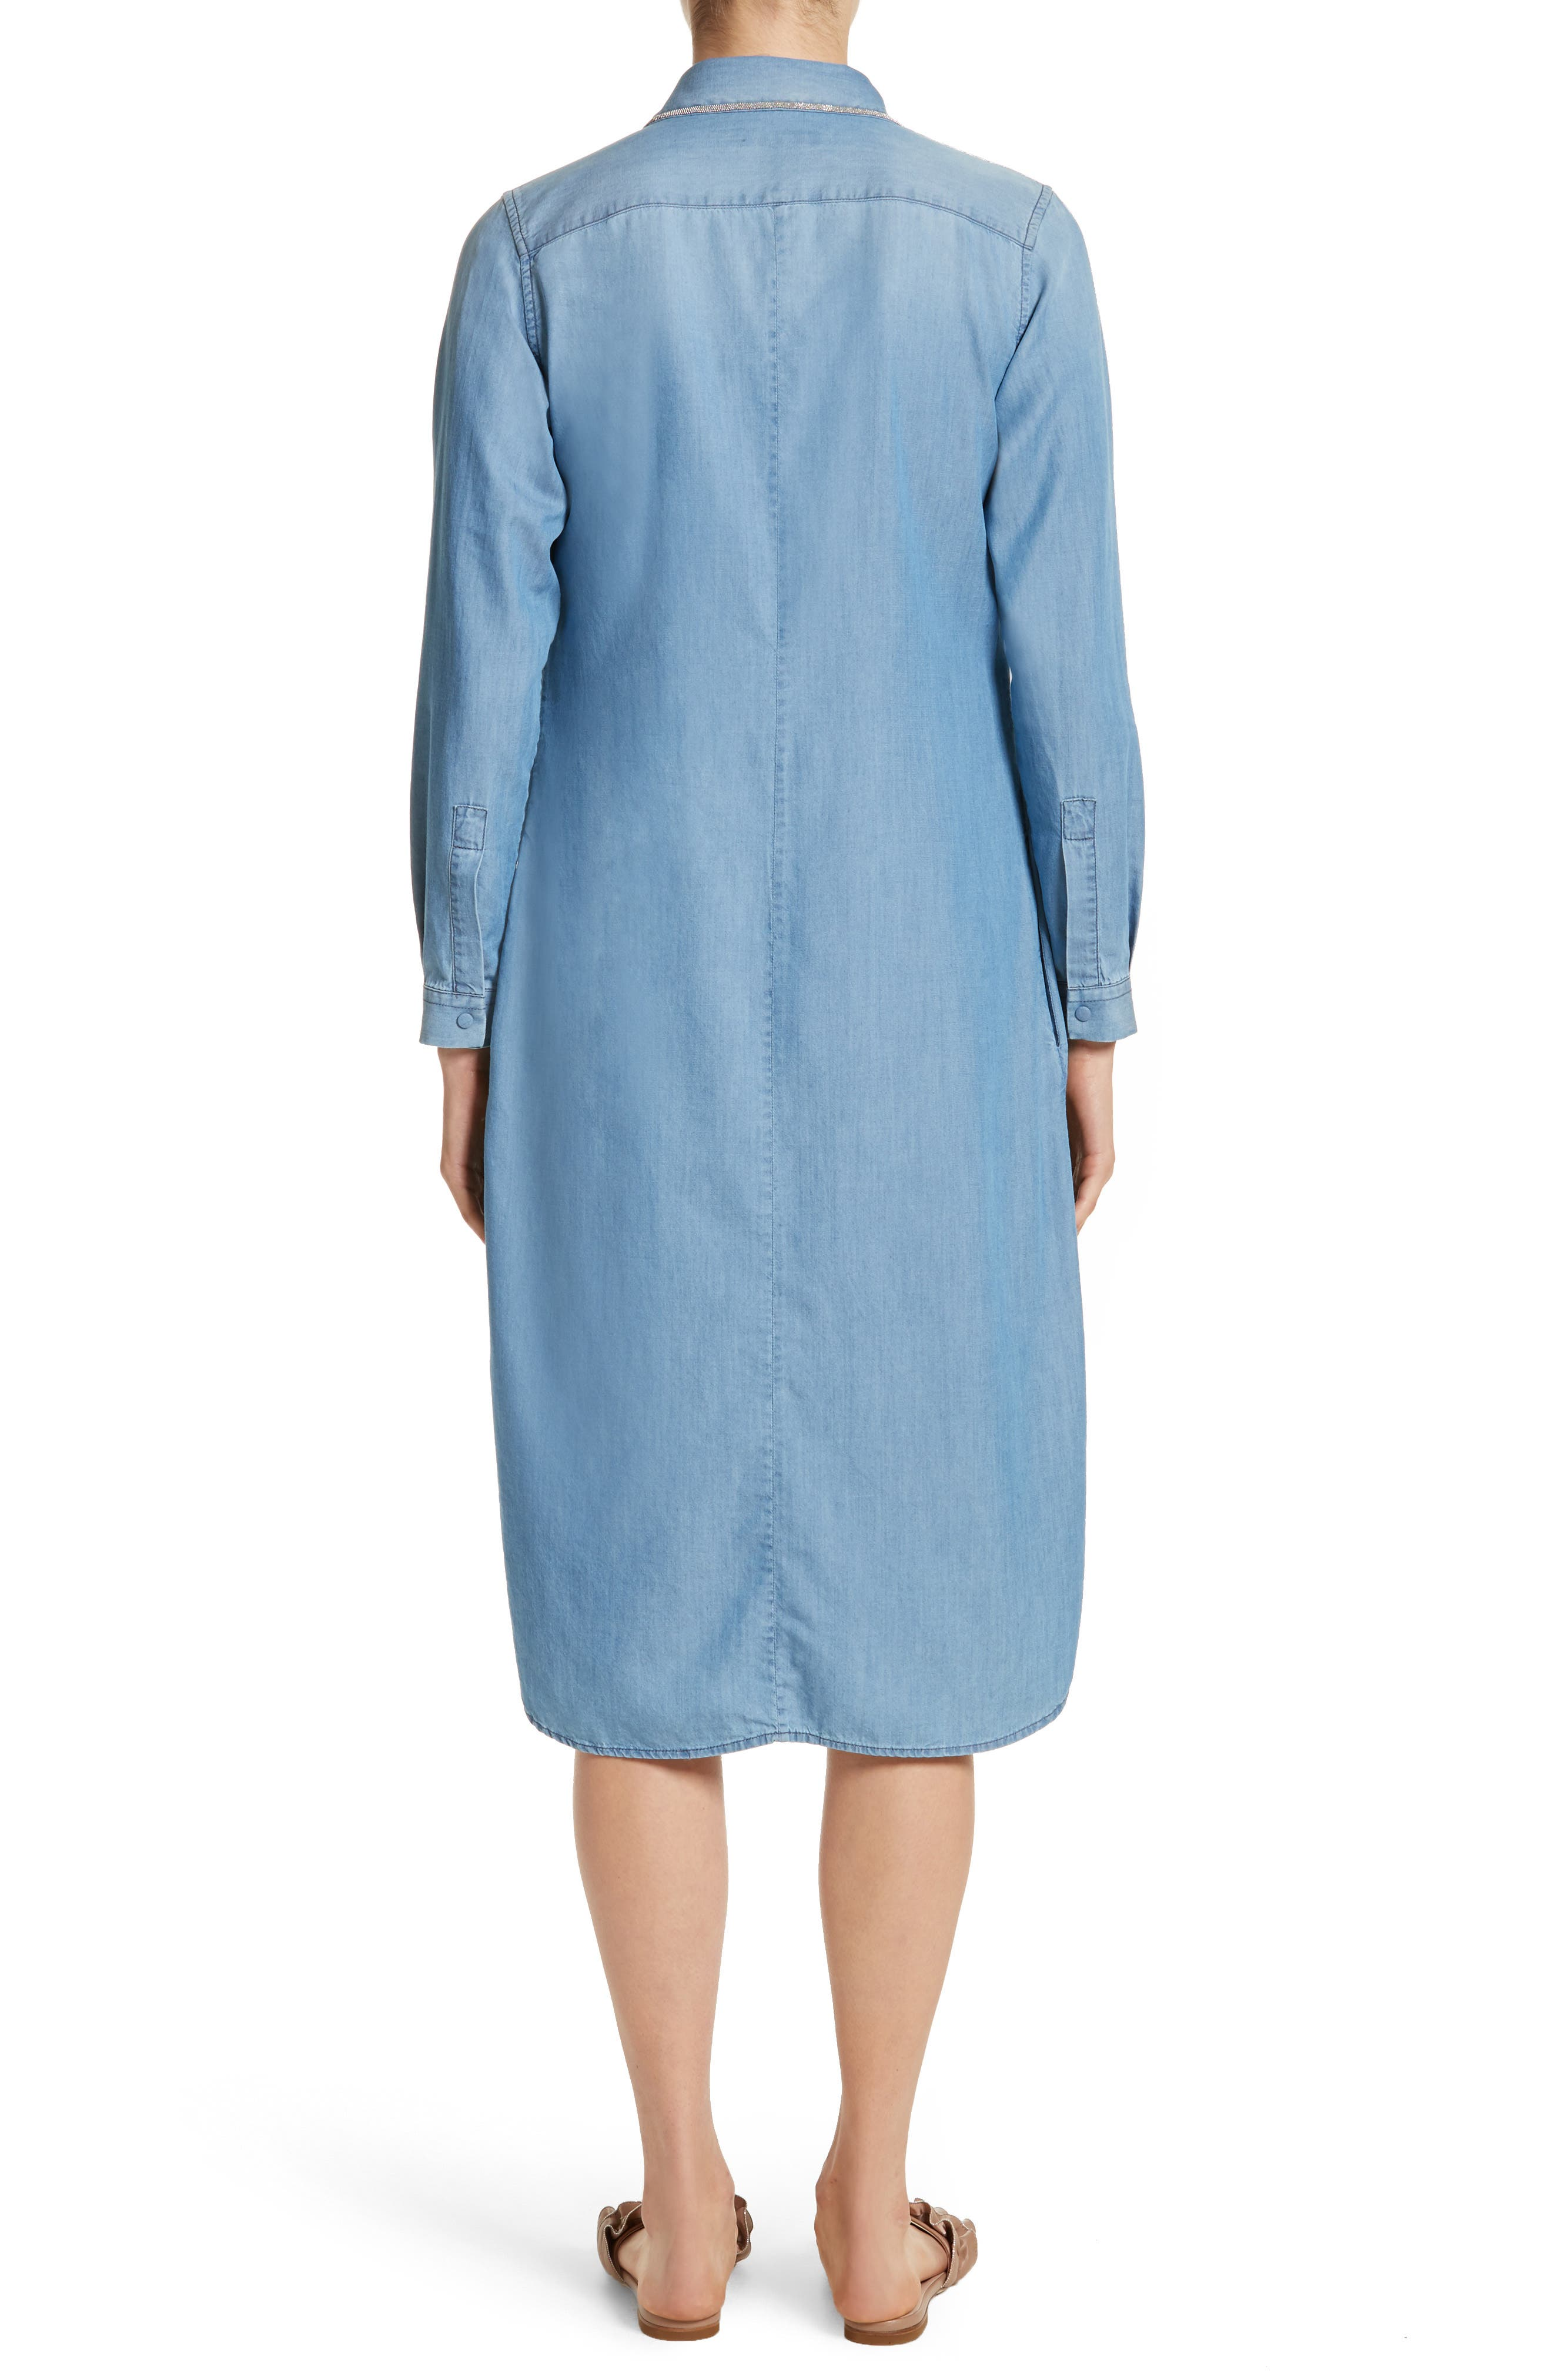 Cotton & Cashmere Chambray Shirtdress,                             Alternate thumbnail 2, color,                             Denim Blue